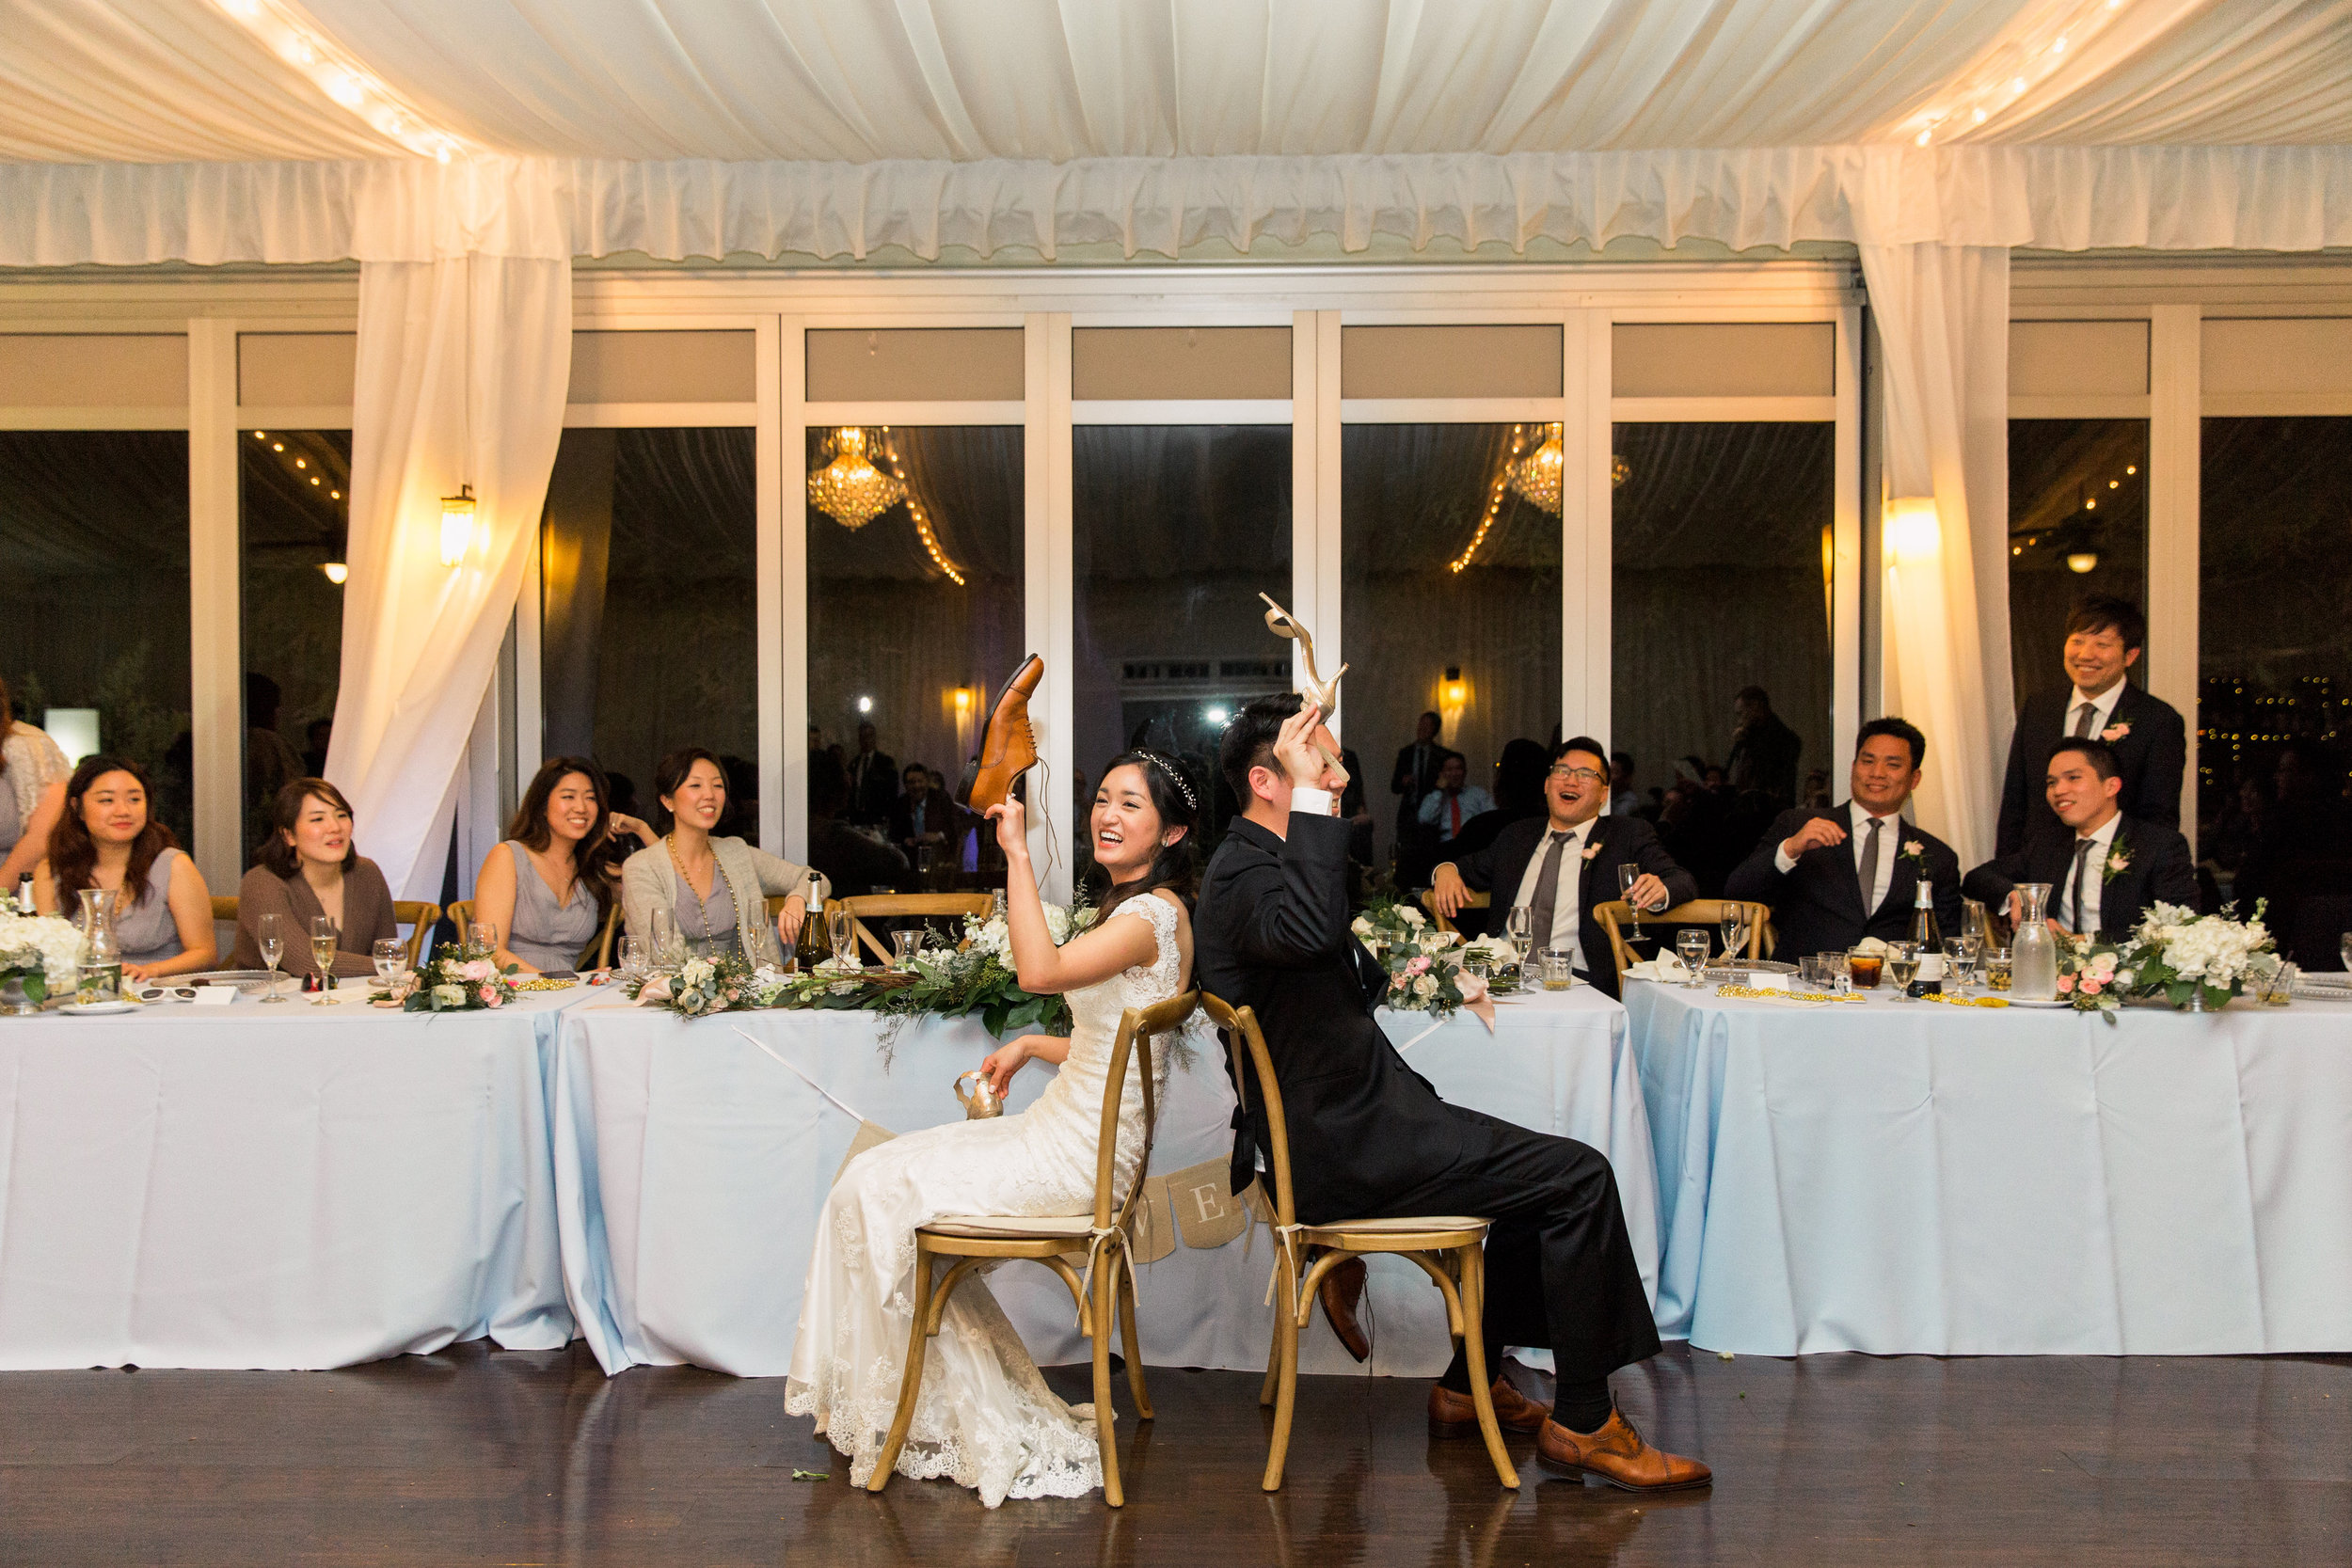 JA_Wedding_Reception_335.jpg